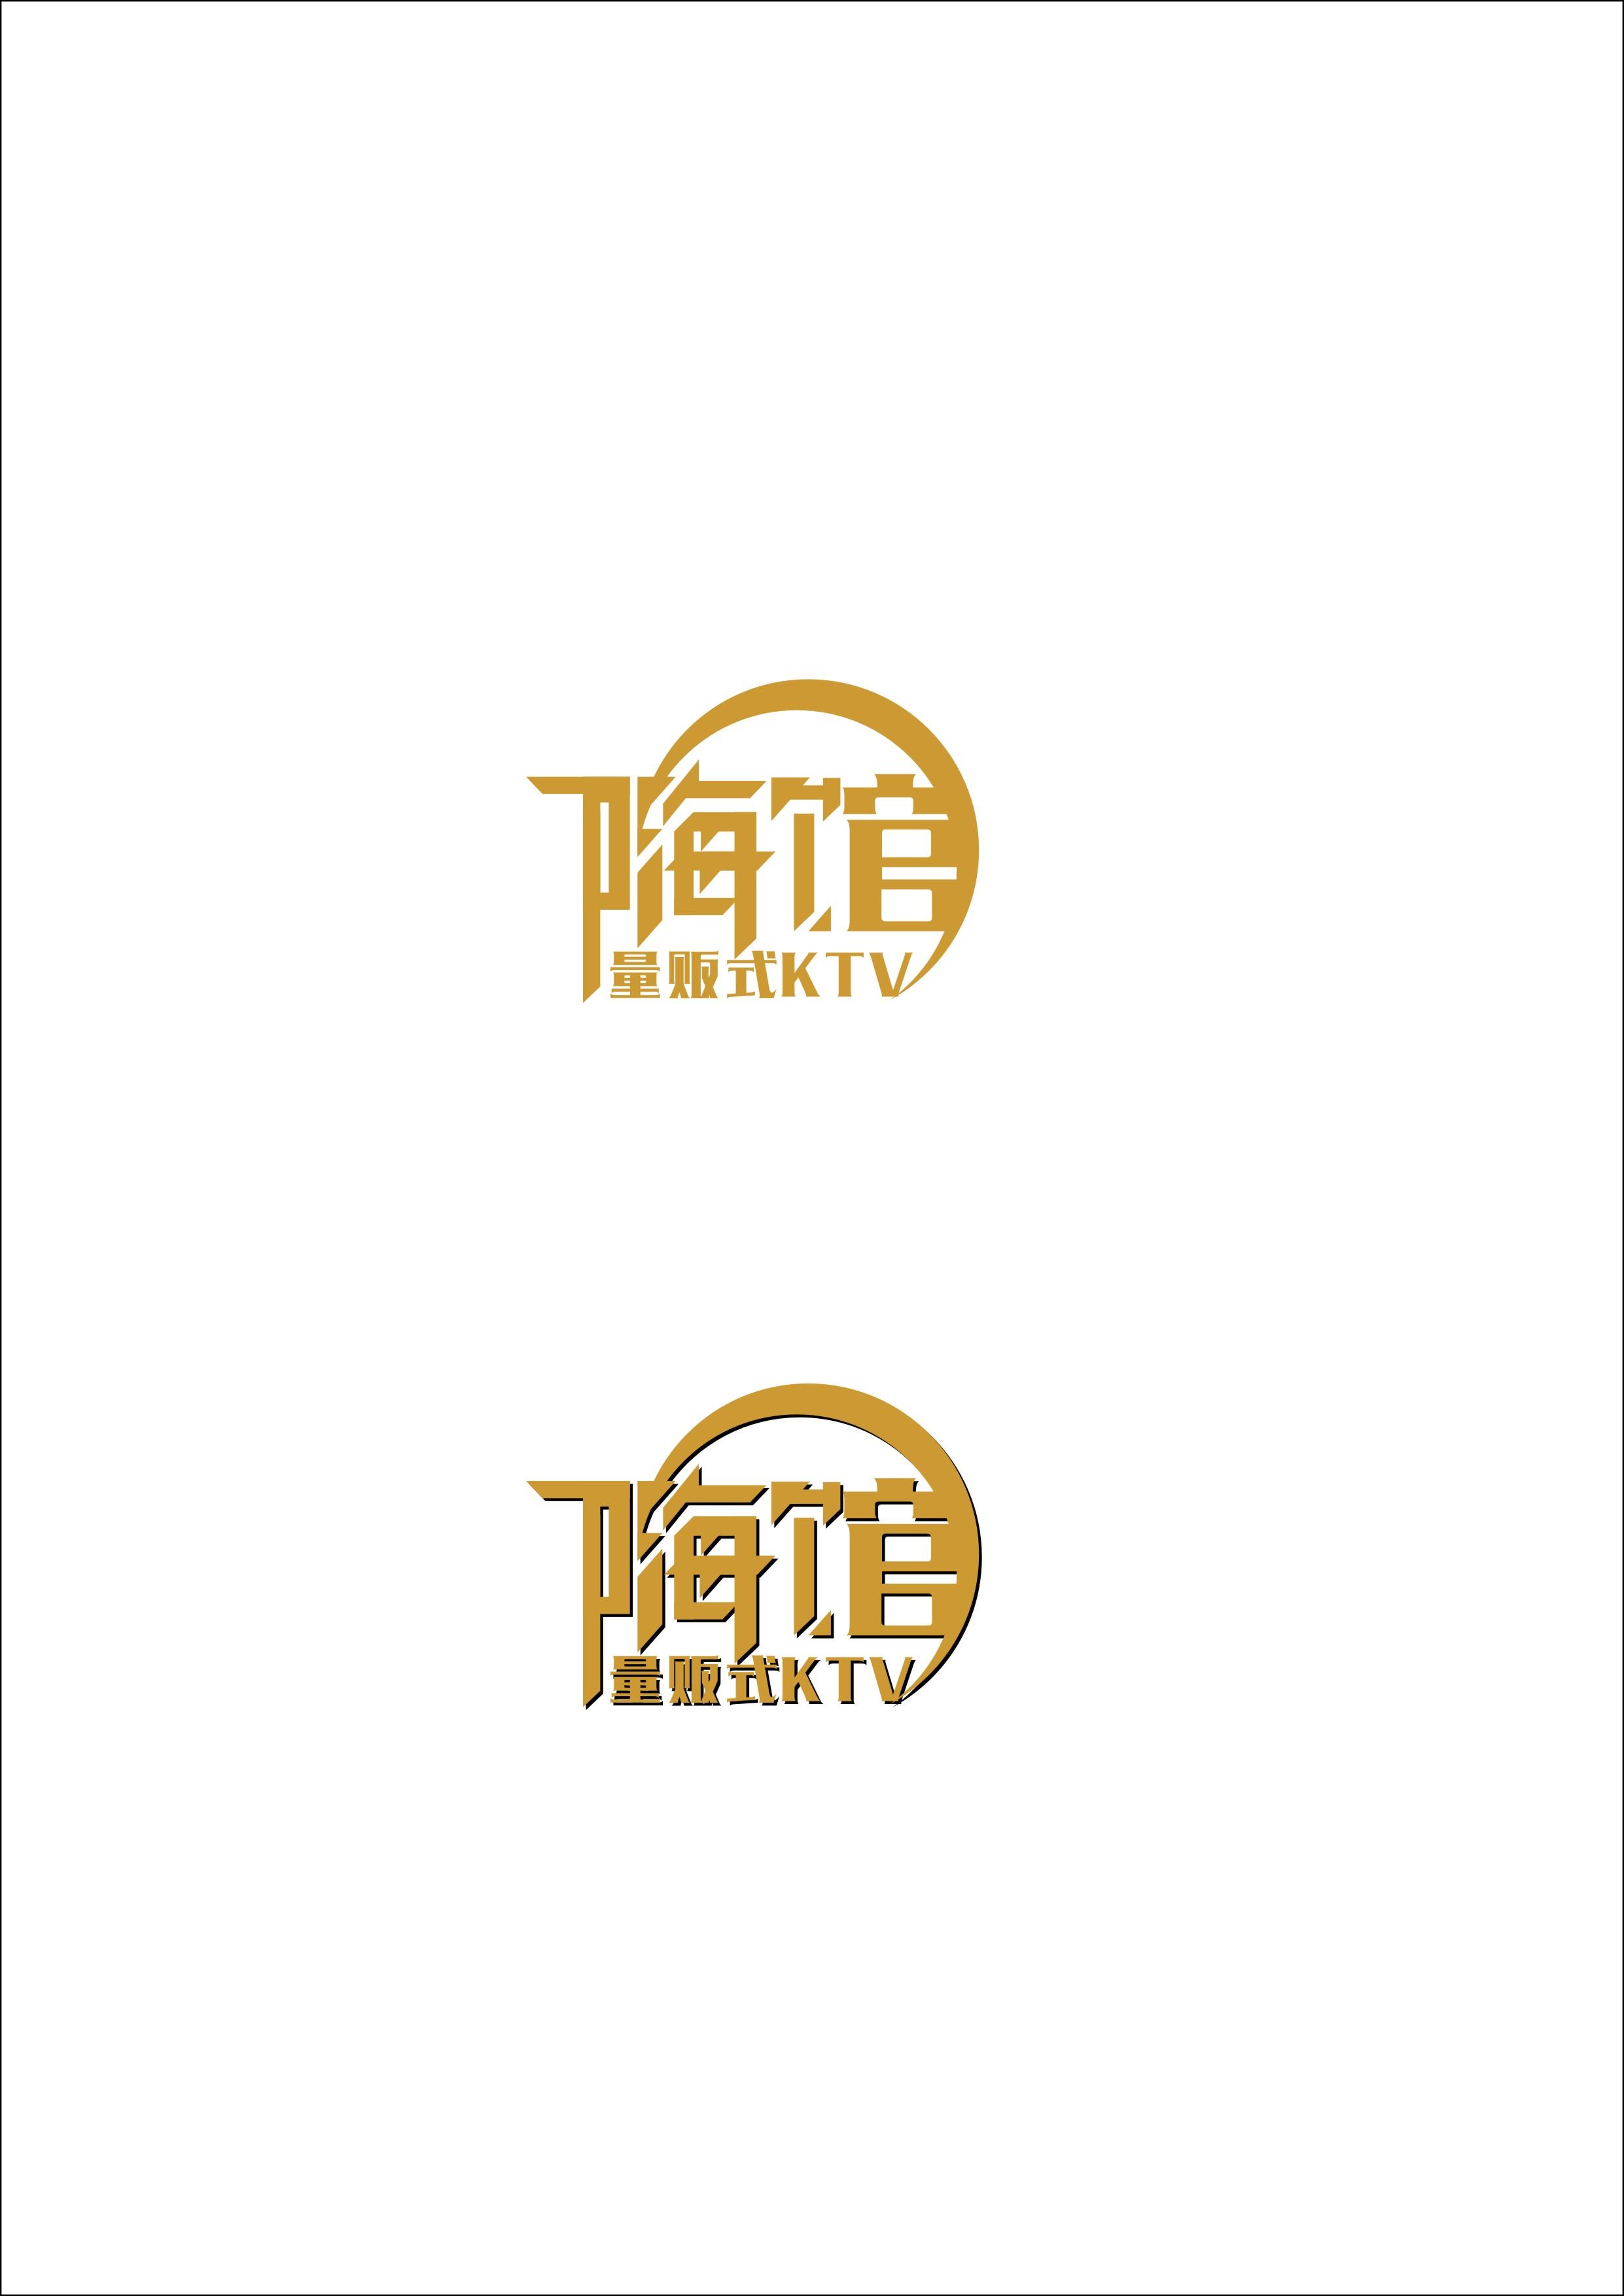 logo logo 标志 设计 矢量 矢量图 素材 图标 2482_3510 竖版 竖屏